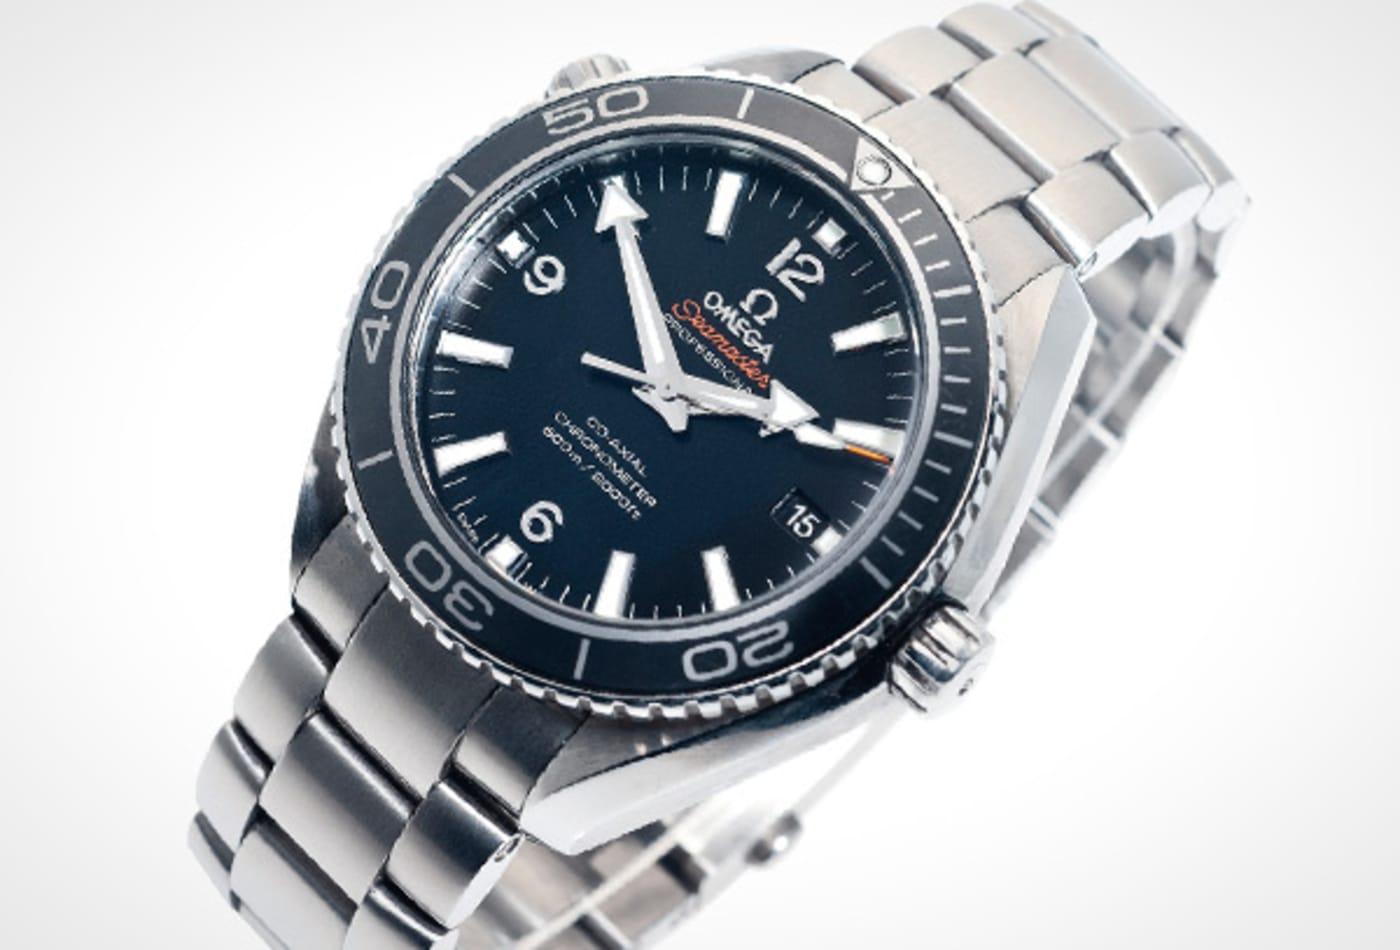 James-Bond-Collectibles-omega-watch.jpg